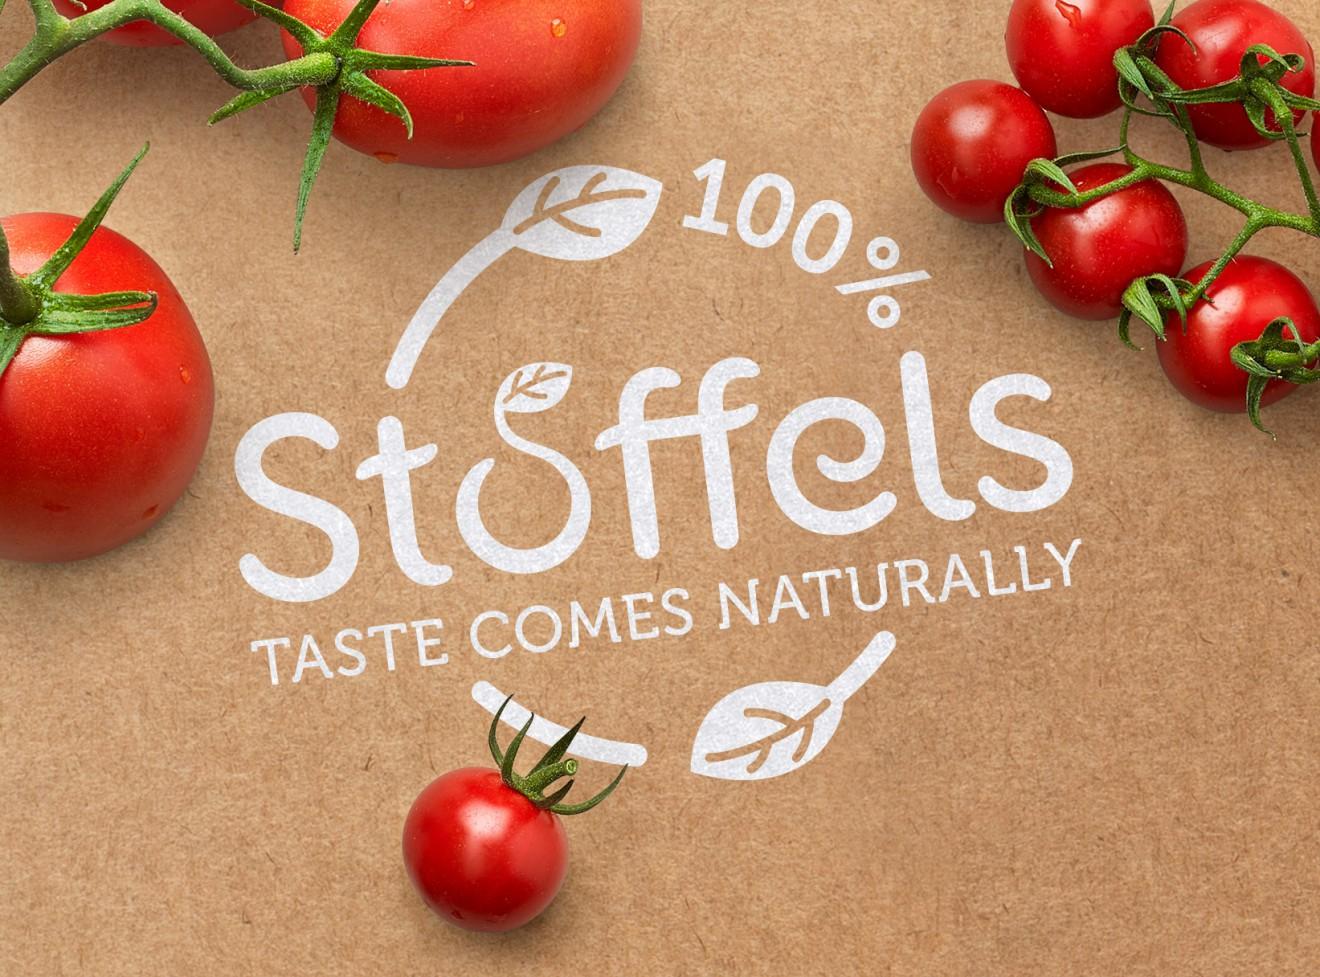 Quatre Mains package design - stoffel, naturally, taste, tomaten